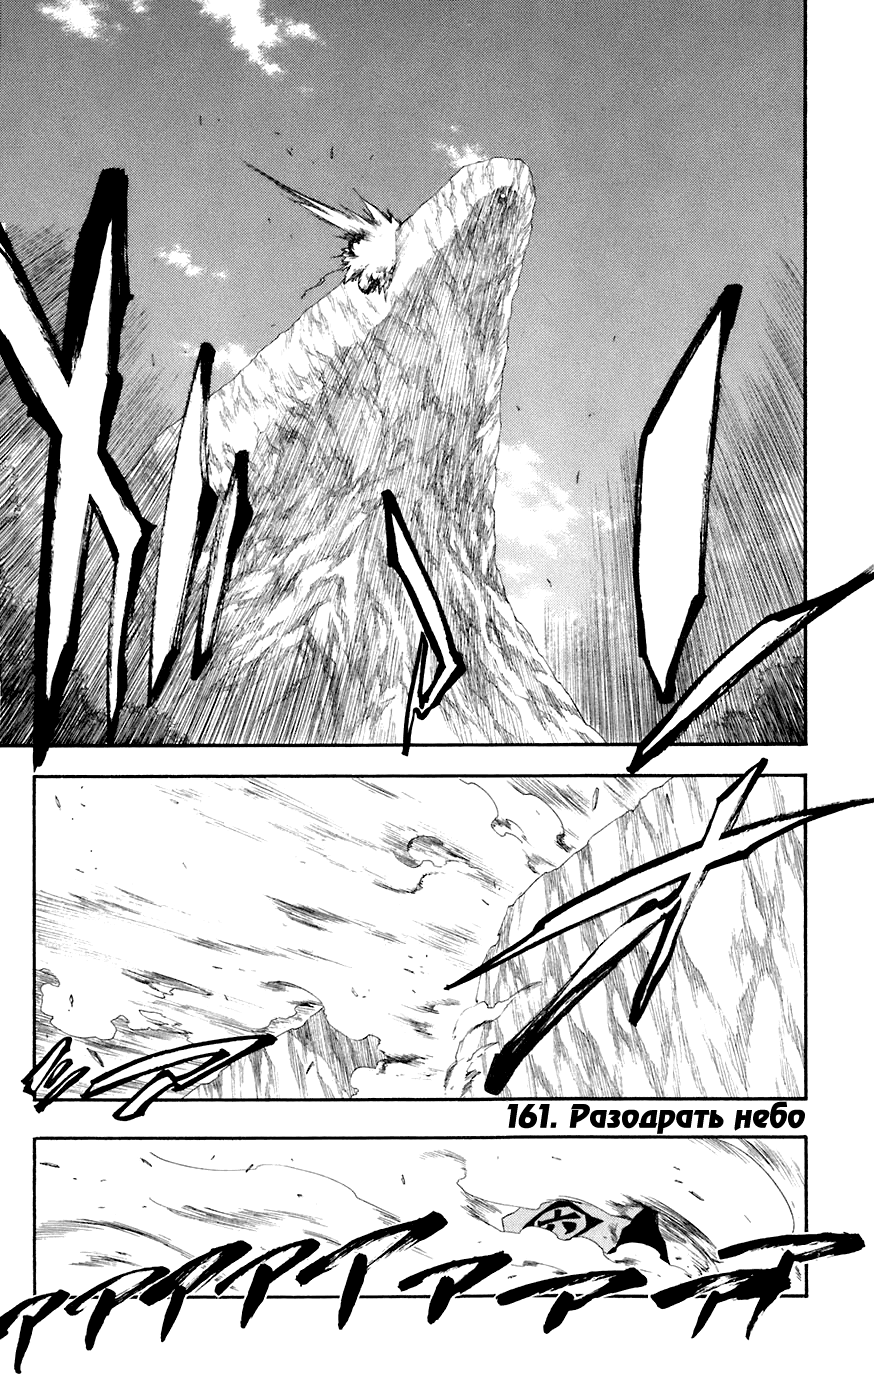 Манга Bleach / Блич Манга Bleach Глава # 161 - Разодрать небо, страница 1